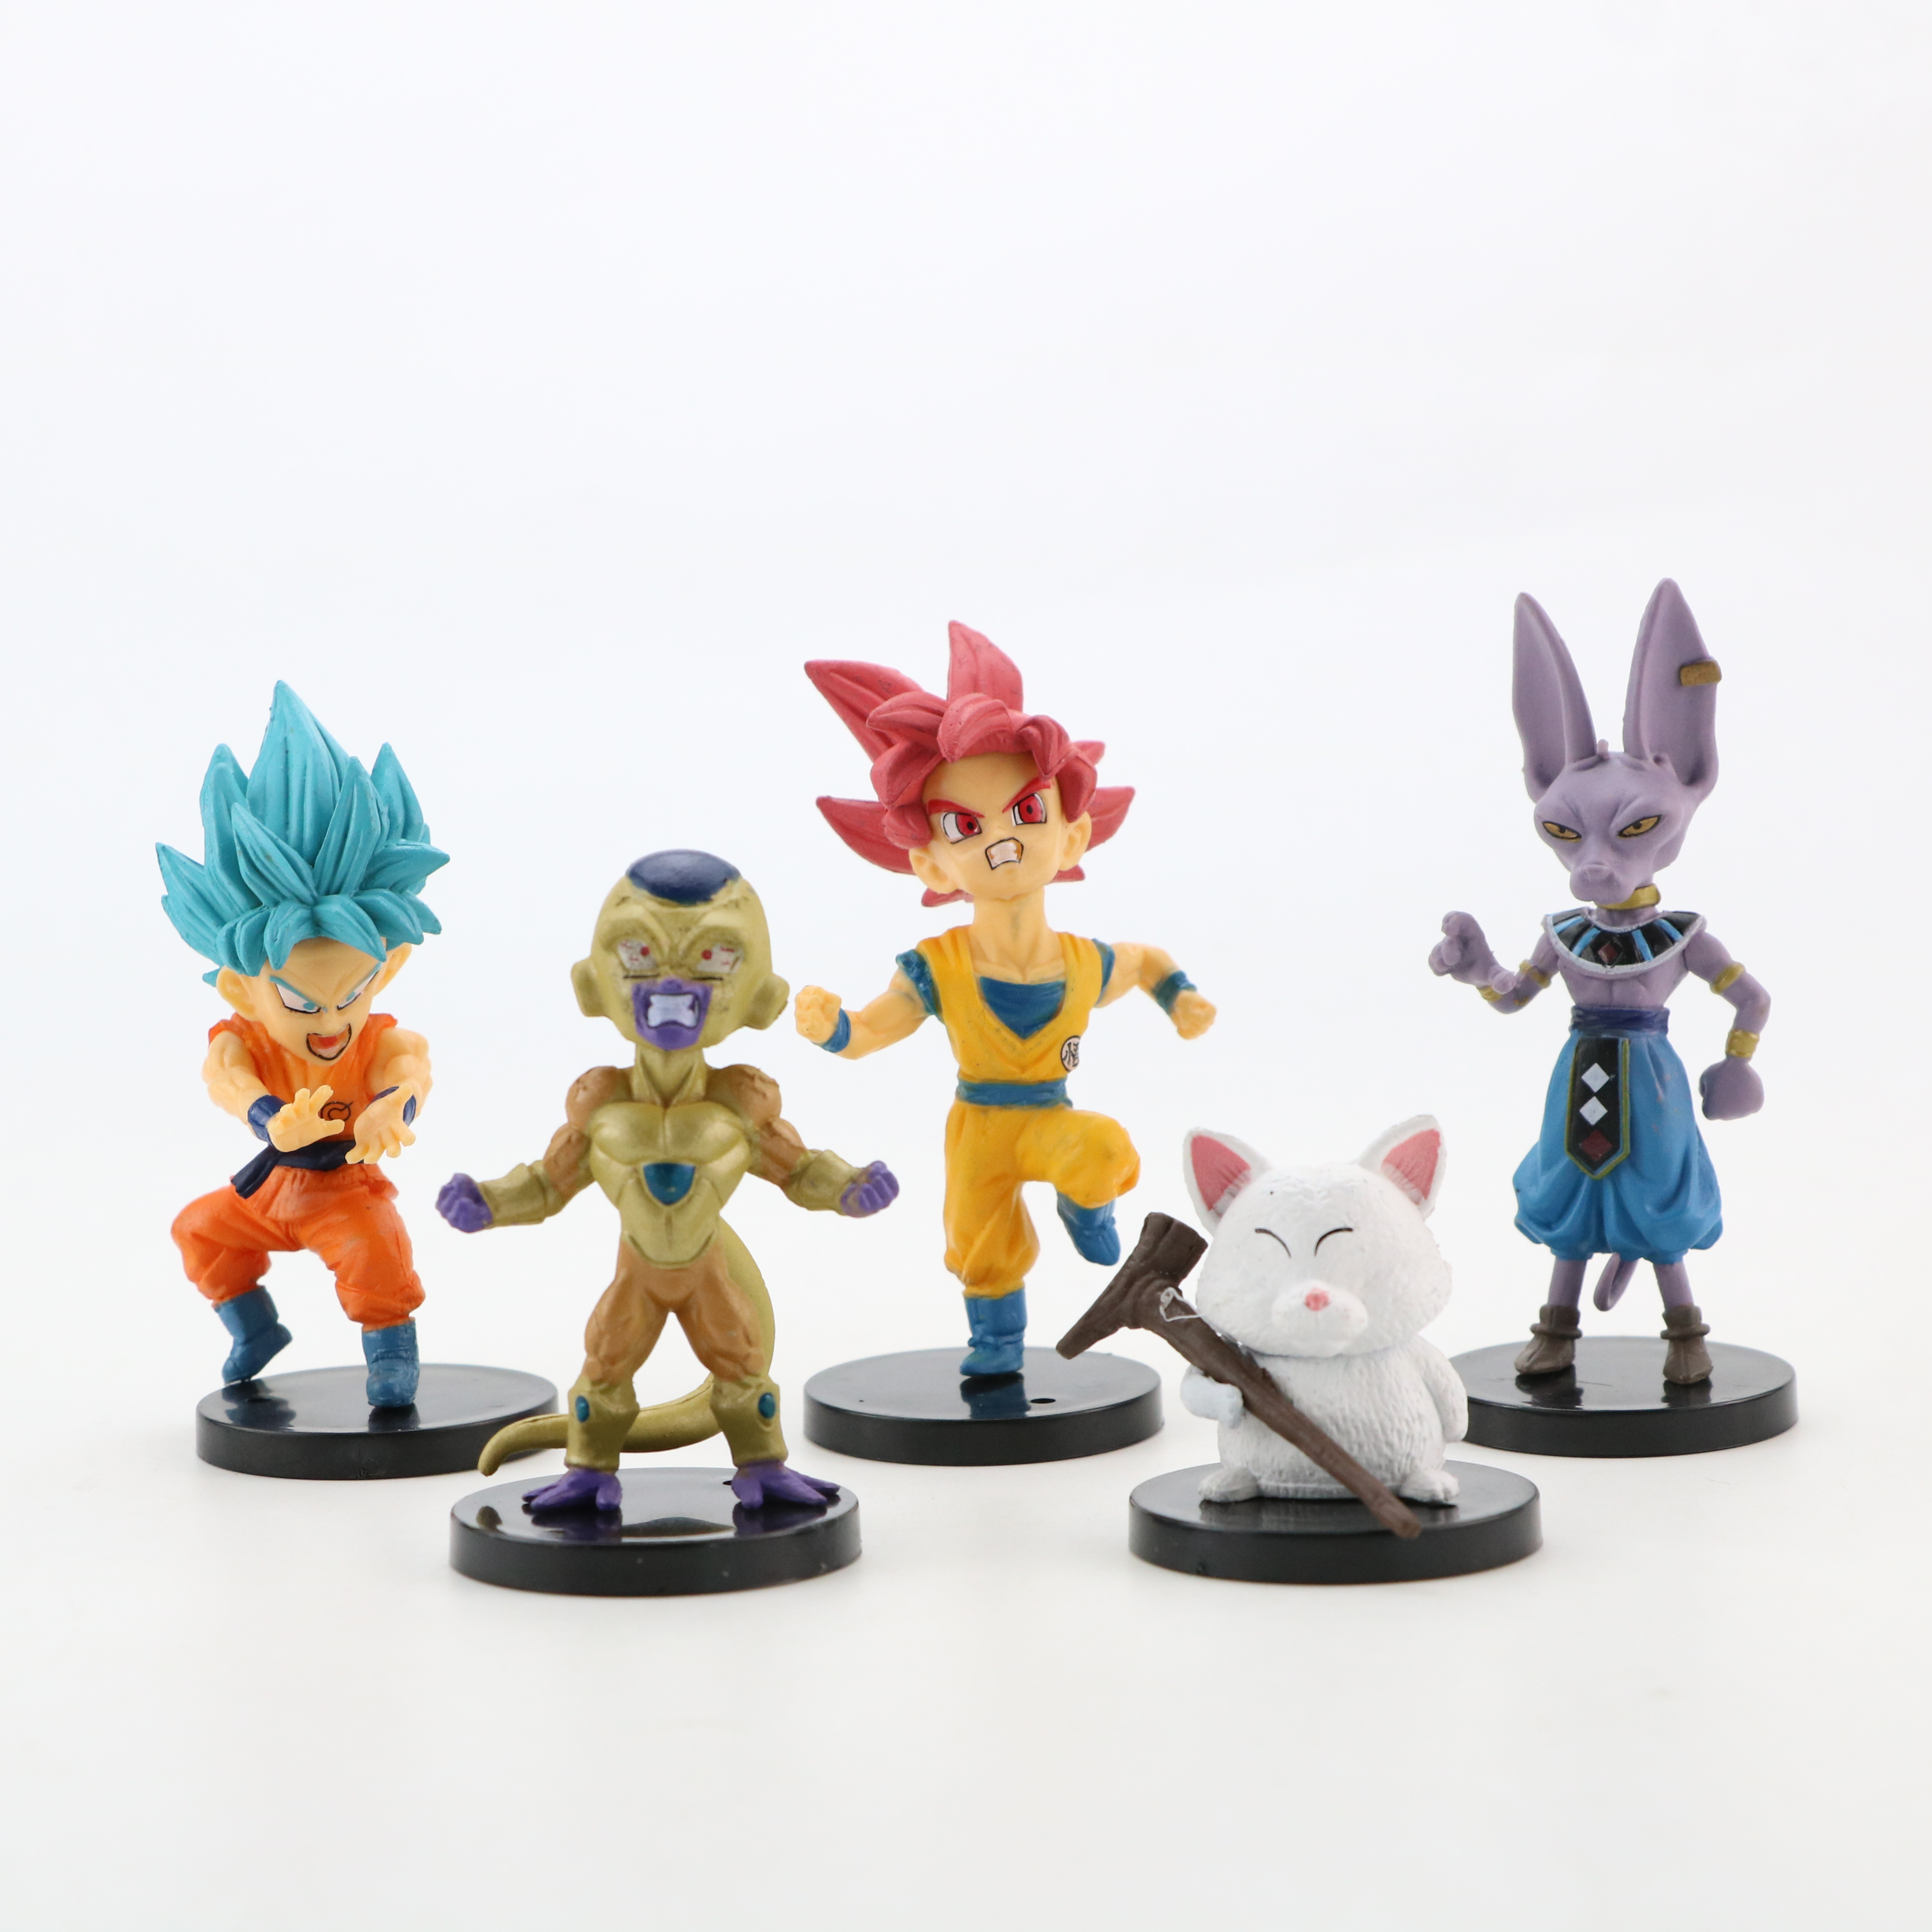 Image 3 - 10pcs/lot Dragon Ball Gogeta Vegeta Z Son Goku Gohan Broly Trunks Frieza Majin Buu Piccolo Dragonball Action Figure Set PVC ToysAction & Toy Figures   -